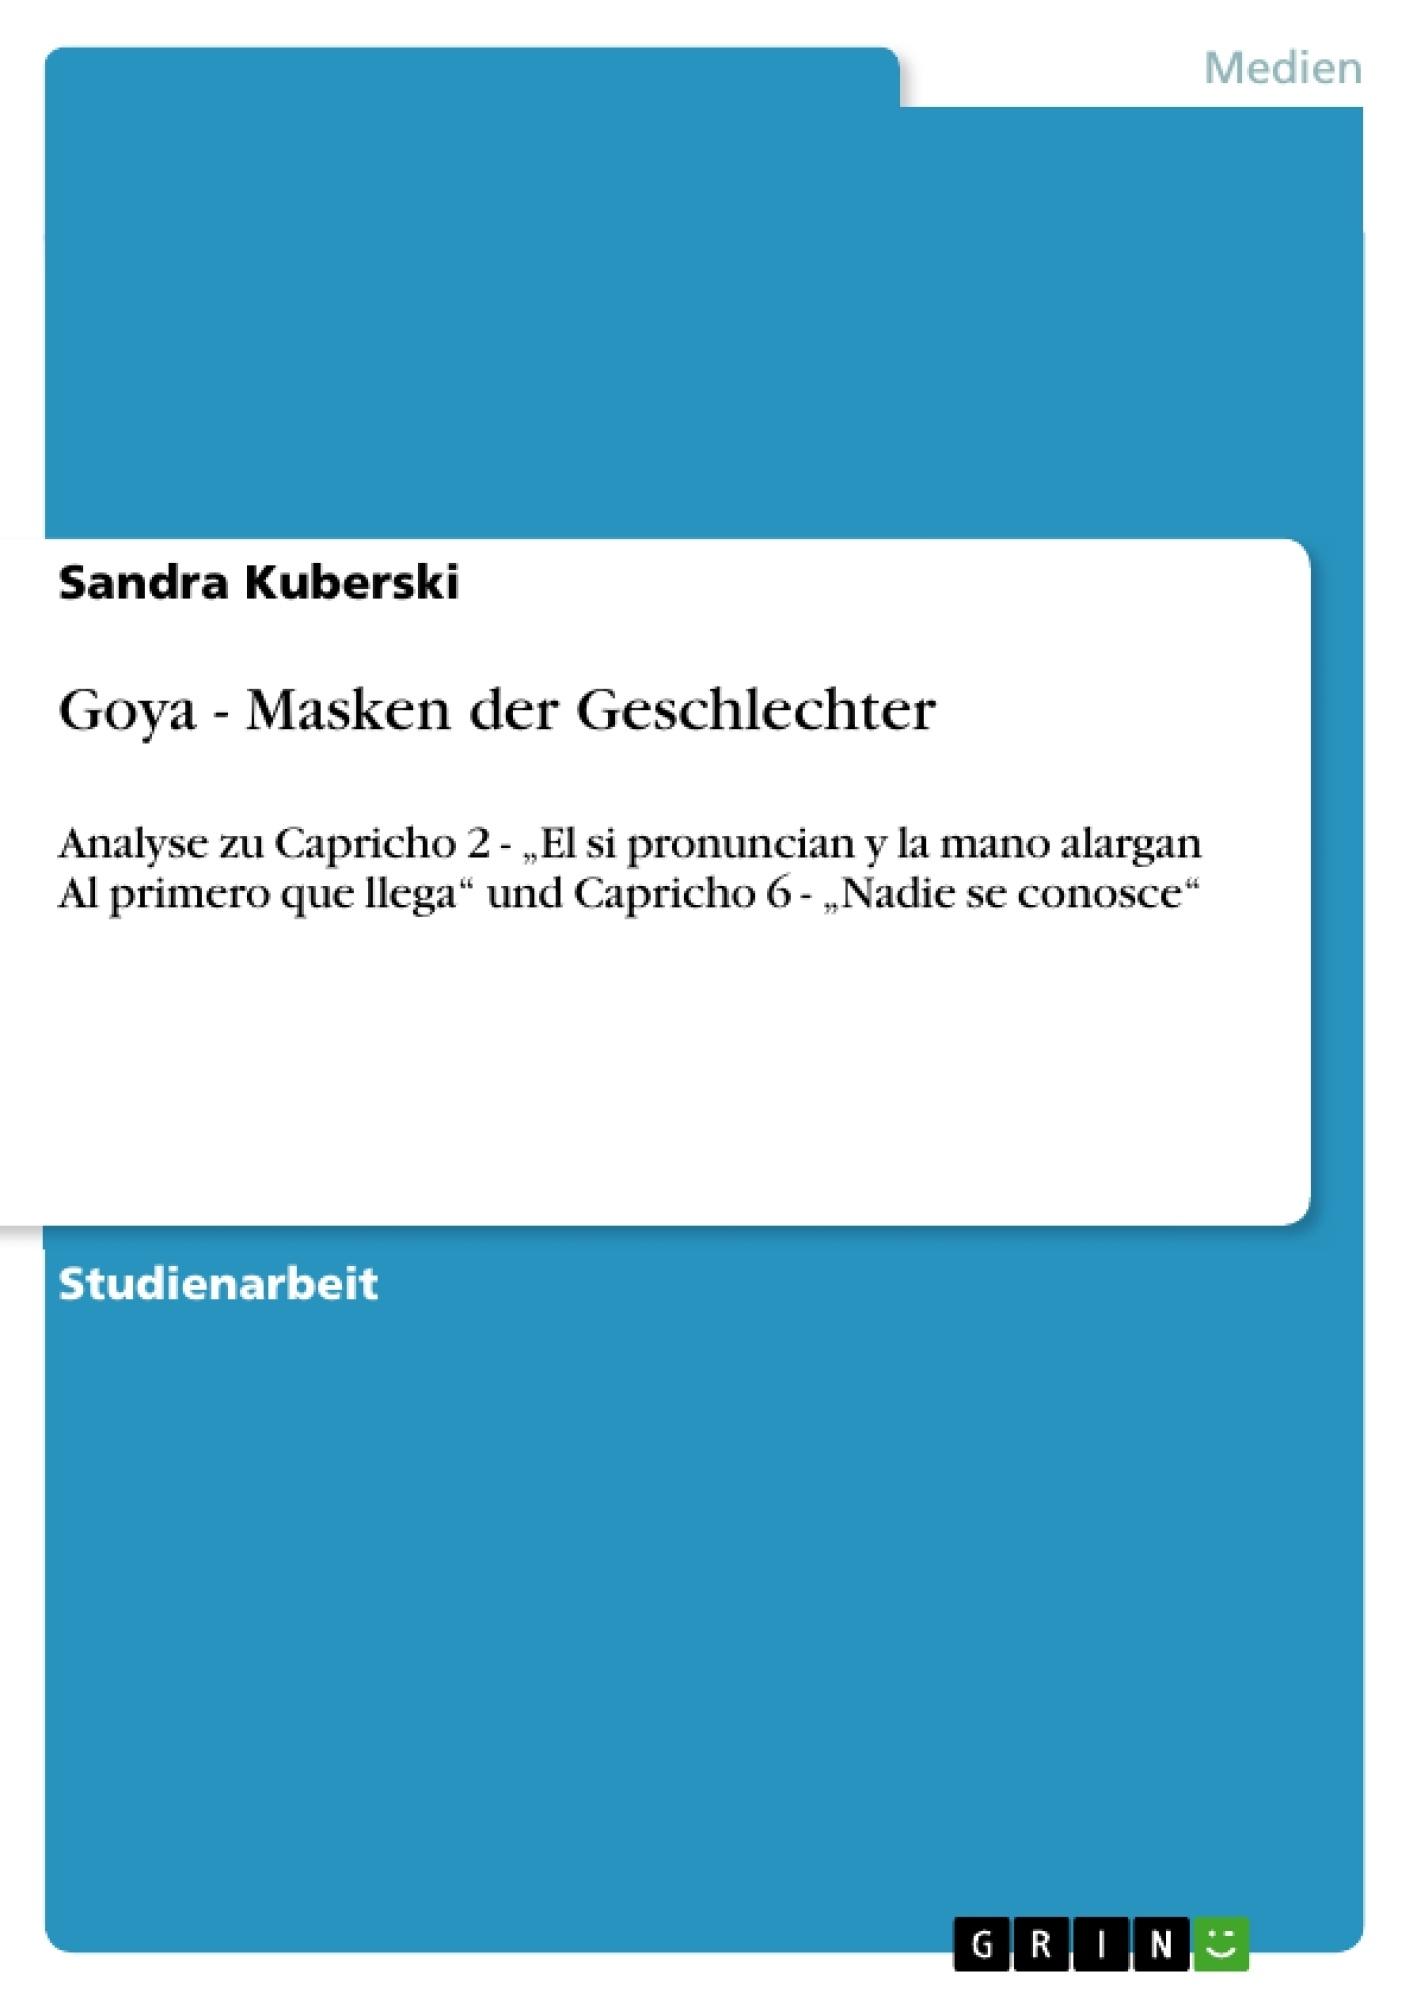 Titel: Goya - Masken der Geschlechter